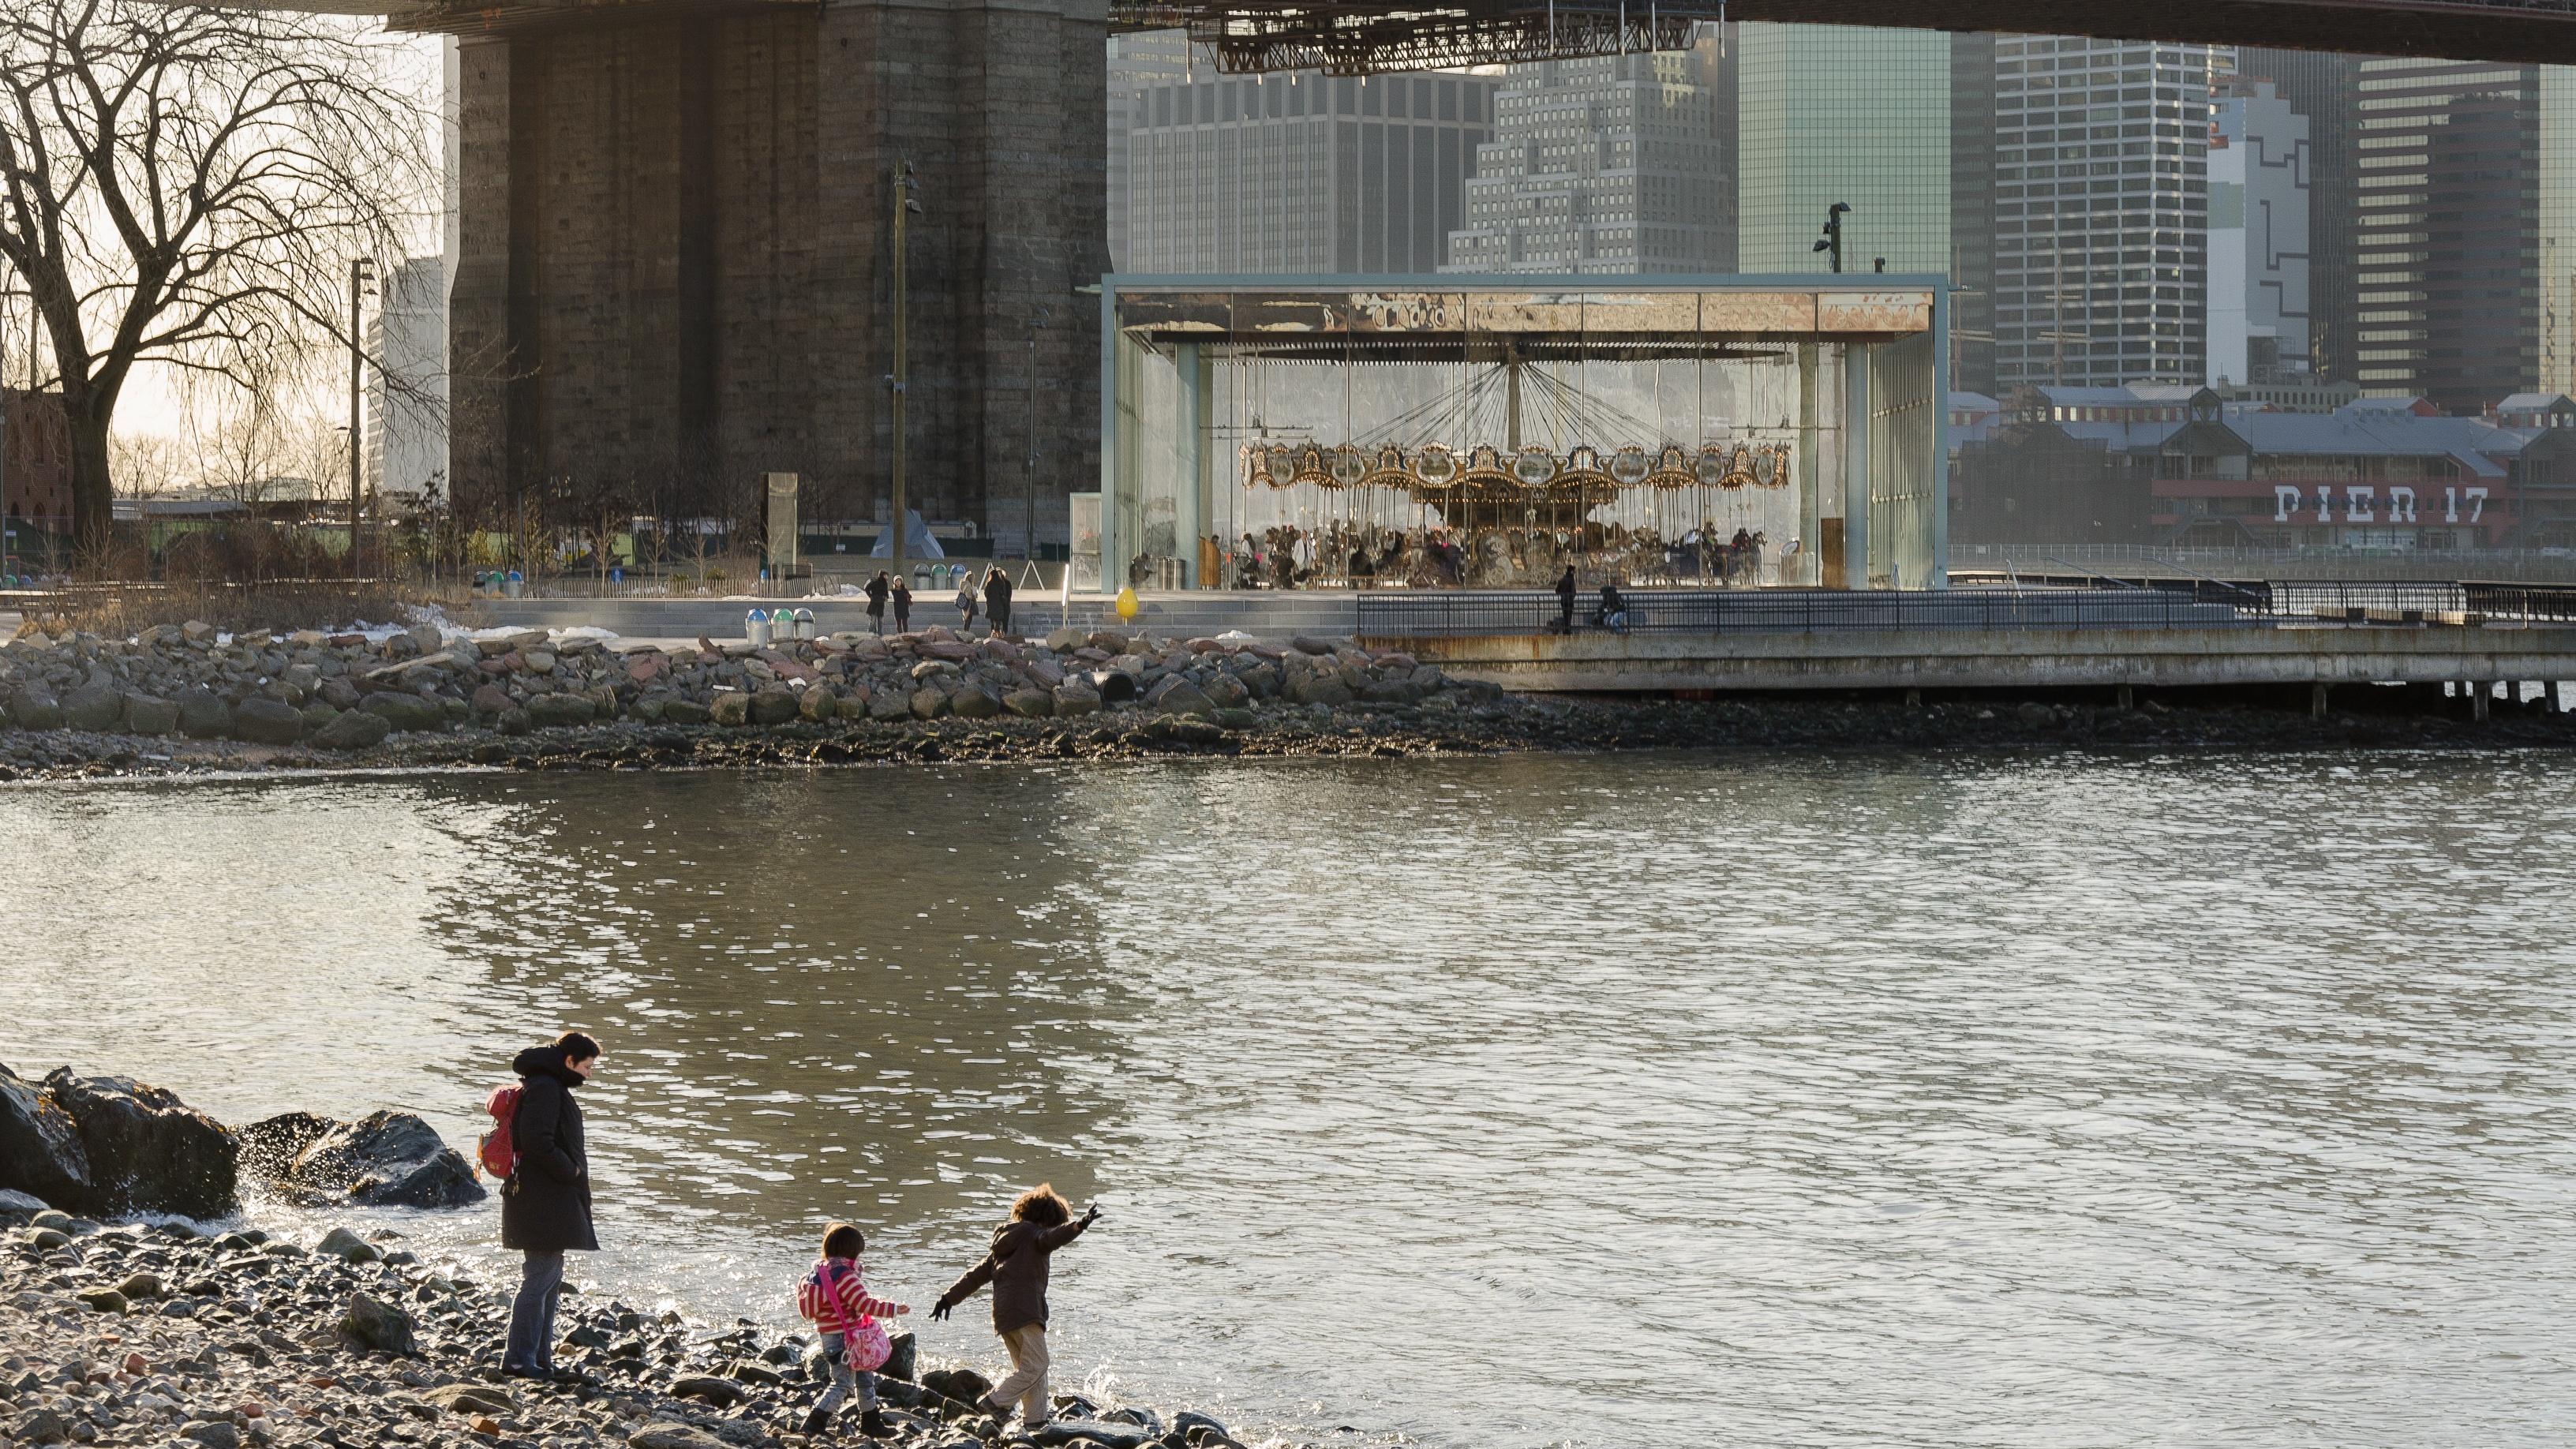 brooklyn bridge waterfront dumbo